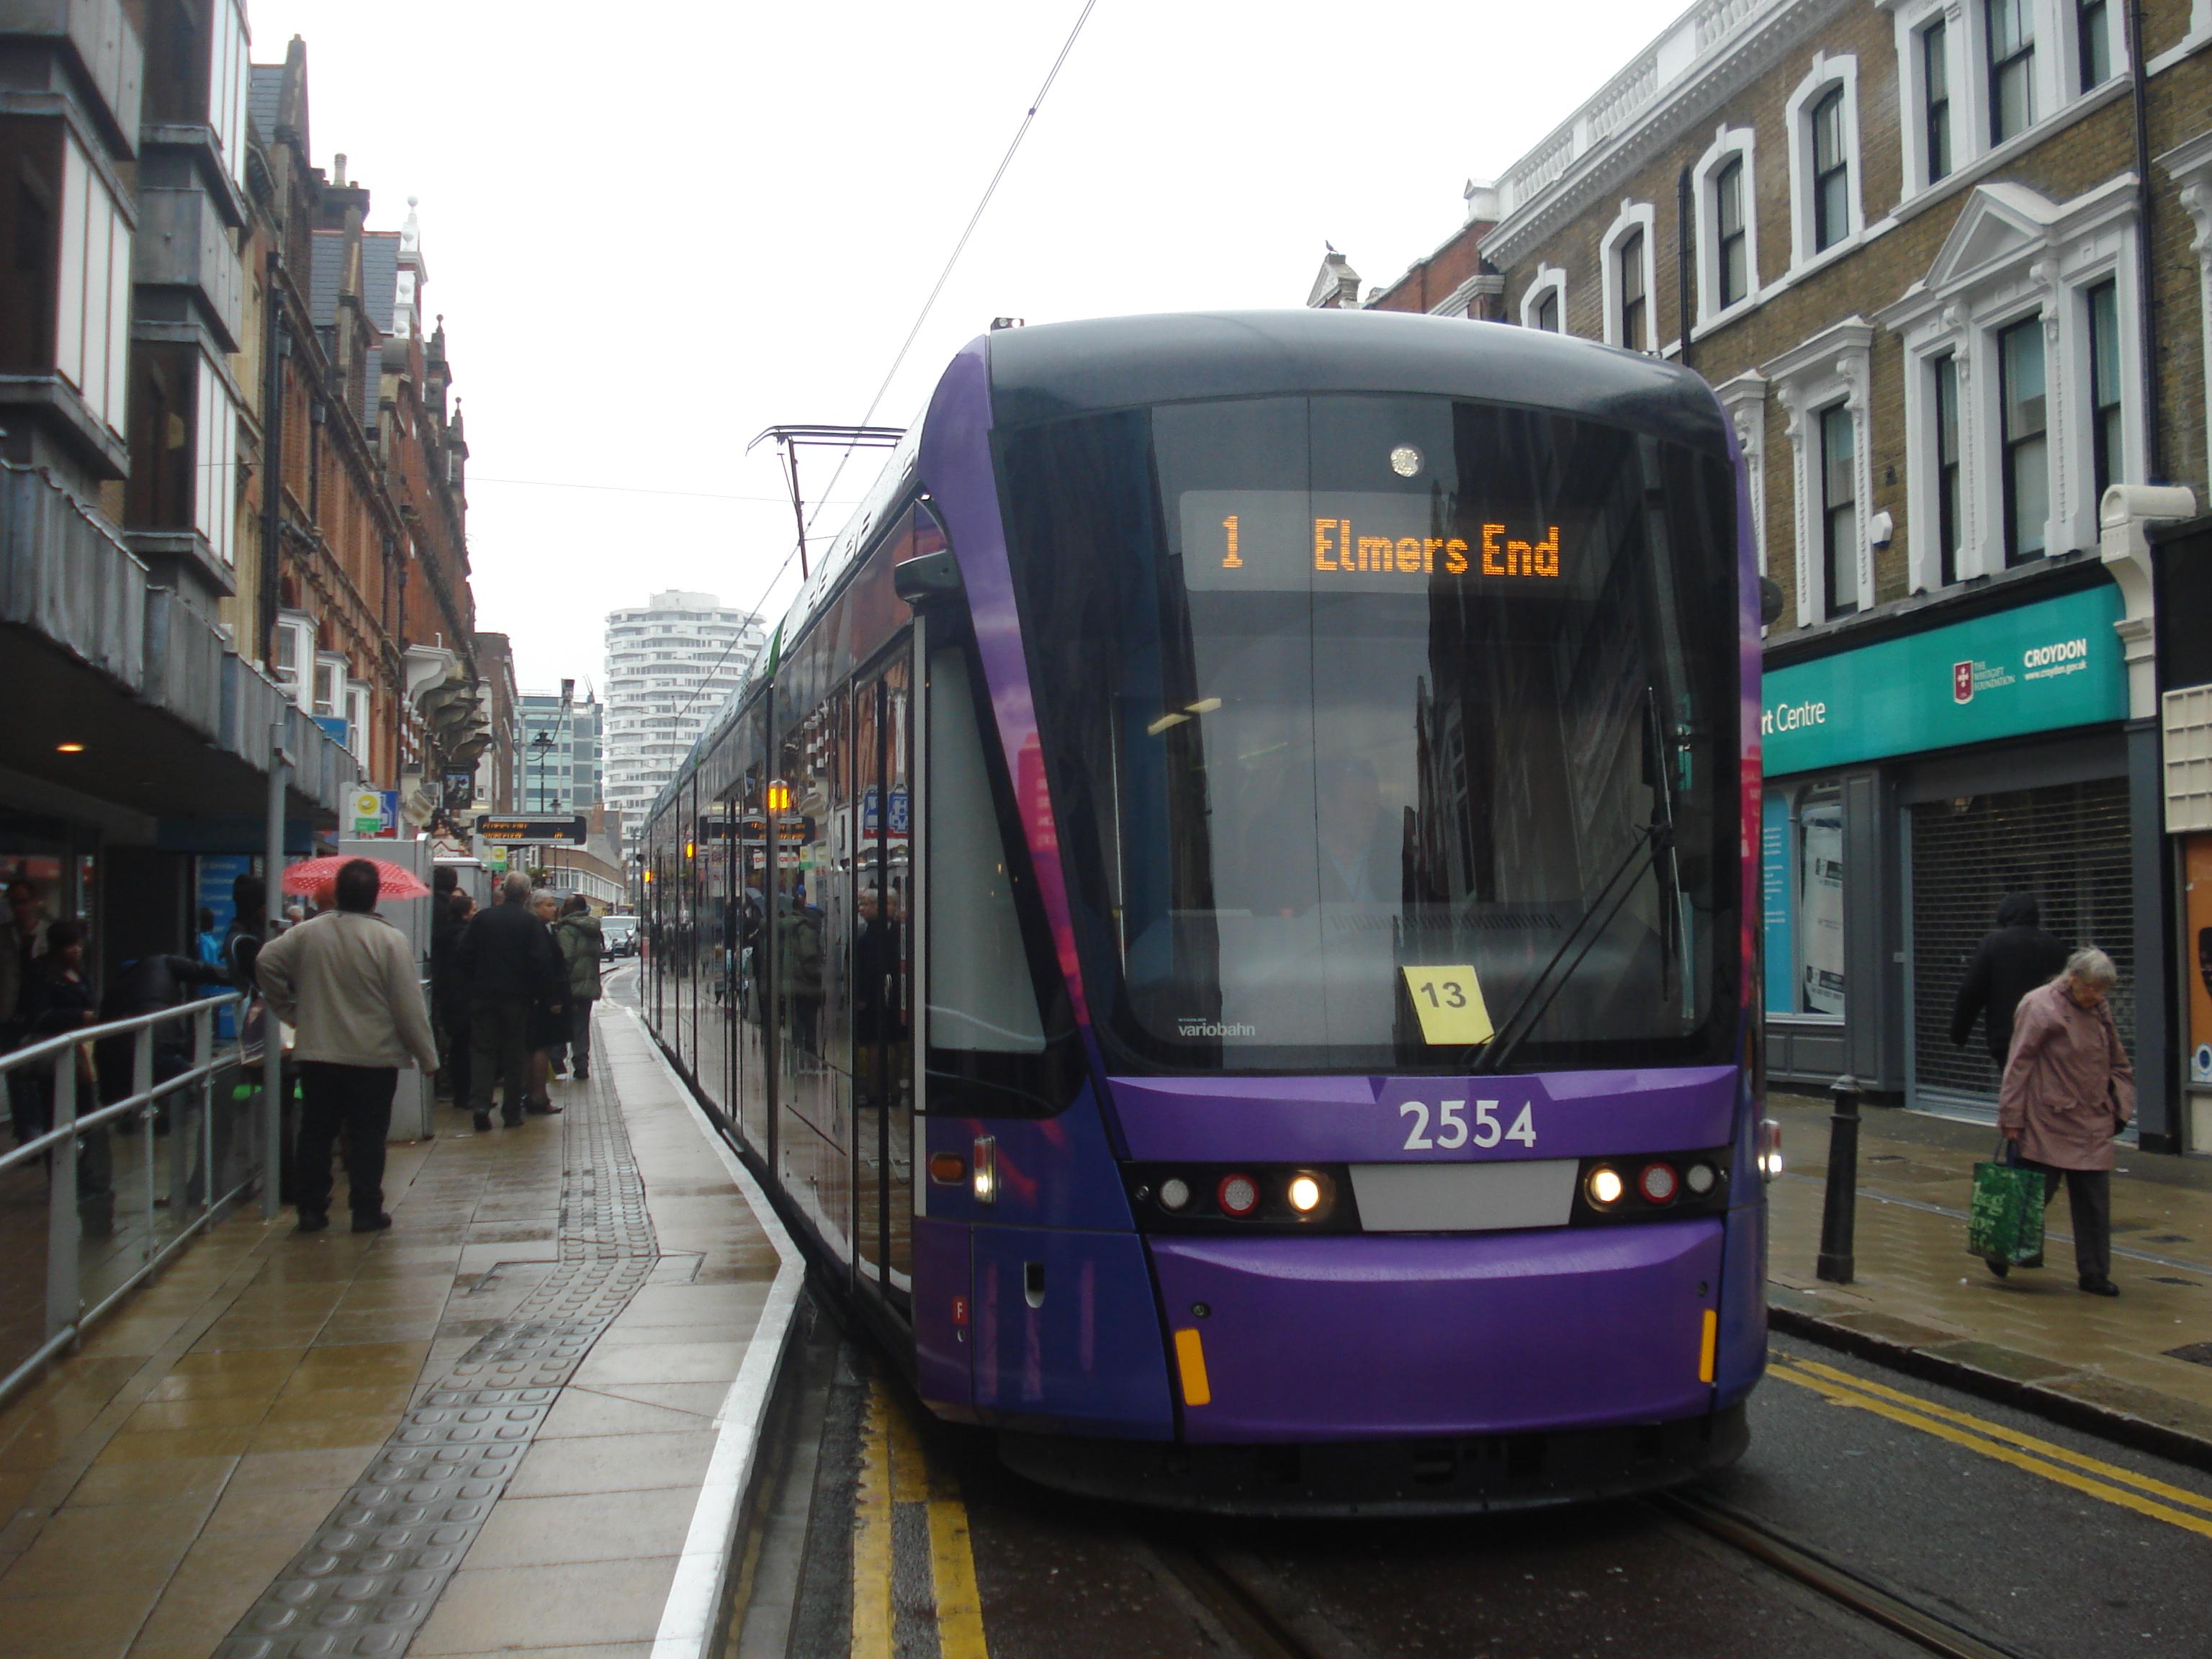 File:Au Morandarte Flickr Tramlink 2554 on Route 1, George Street  (9756266054)